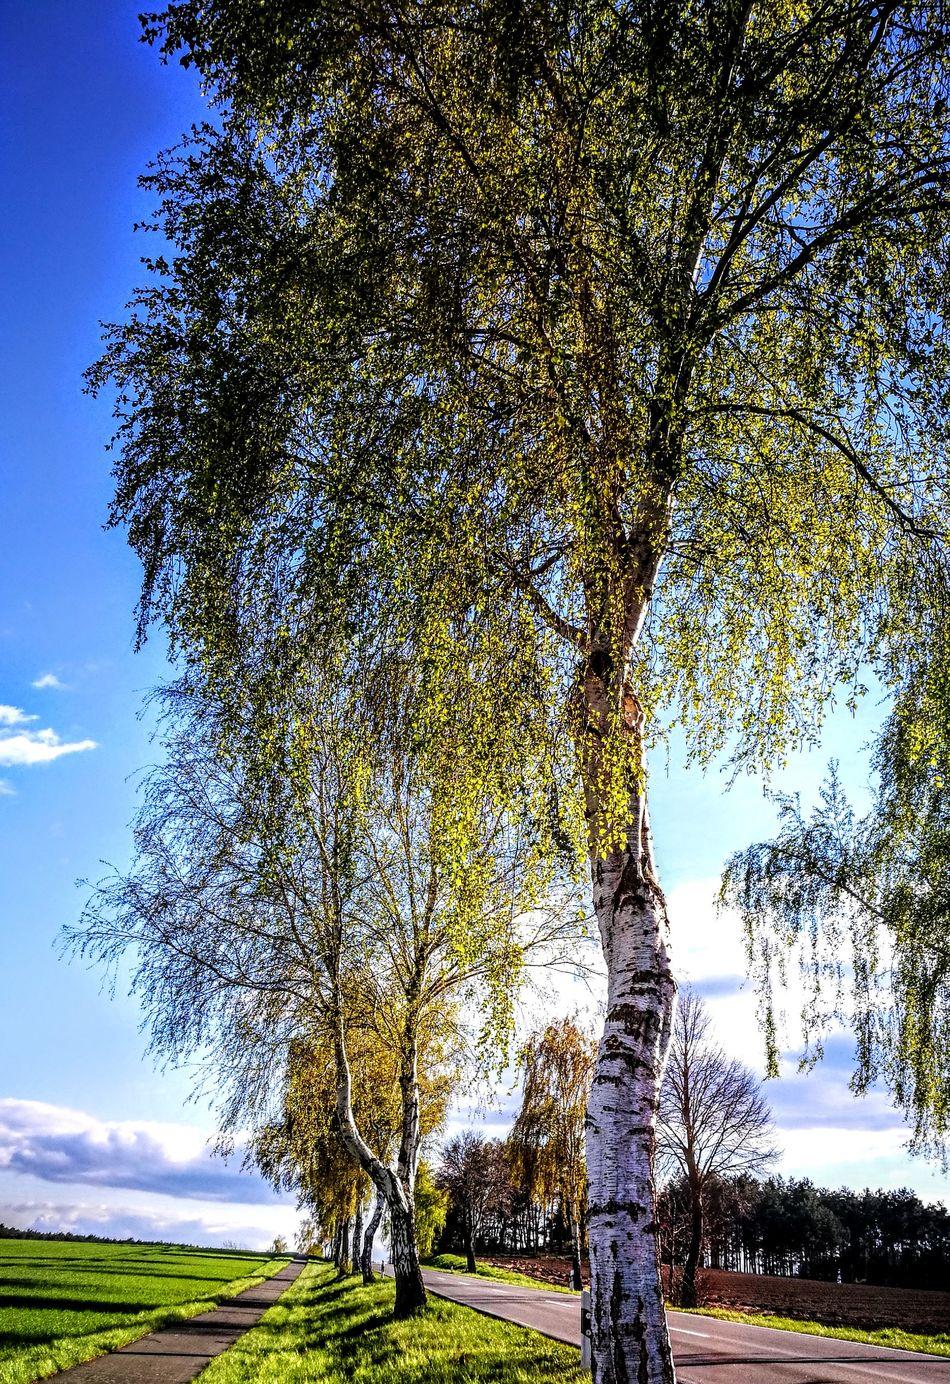 Birken beginnen zu blühen... Tree Growth Field Day Nature Sky Outdoors No People Beauty In Nature GetbetterwithAlex Originalpicture Silhouette Cloud - Sky Scenics Beauty In Nature